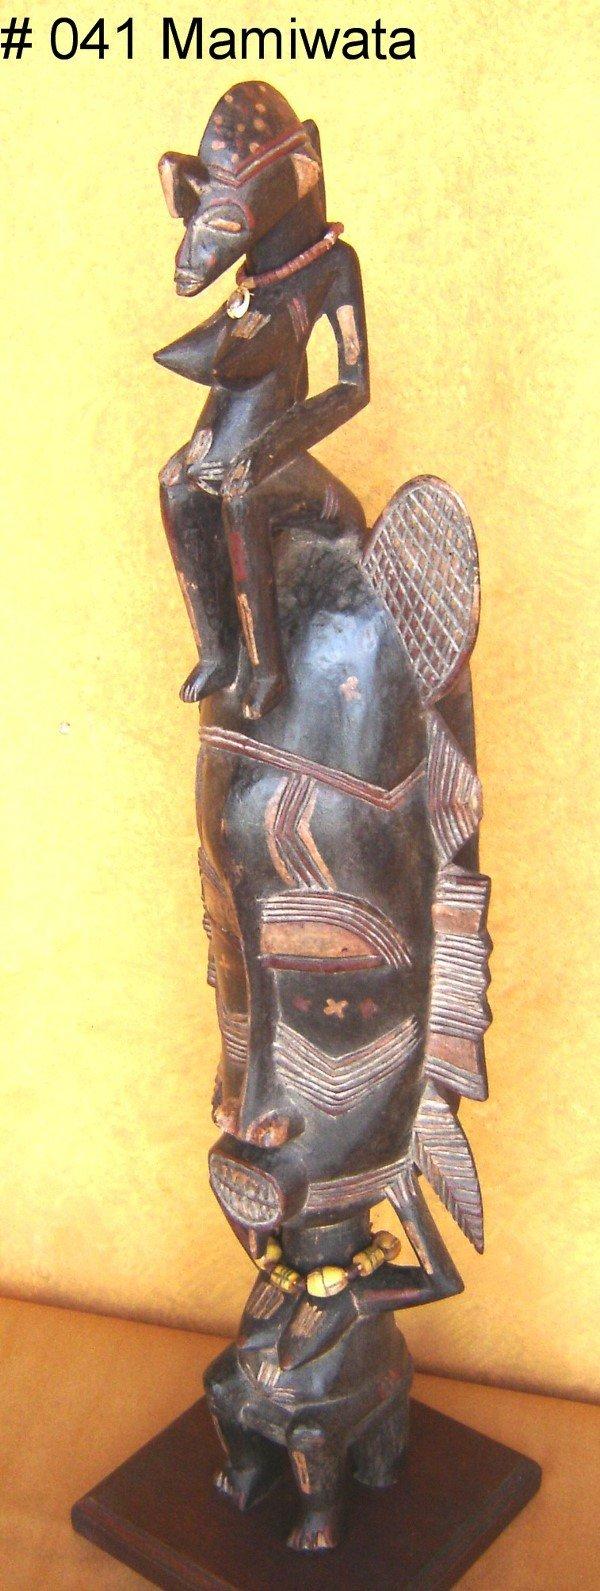 817: MAMIWATA STANDING MASK SENUFO TRIBE IVORY COAST